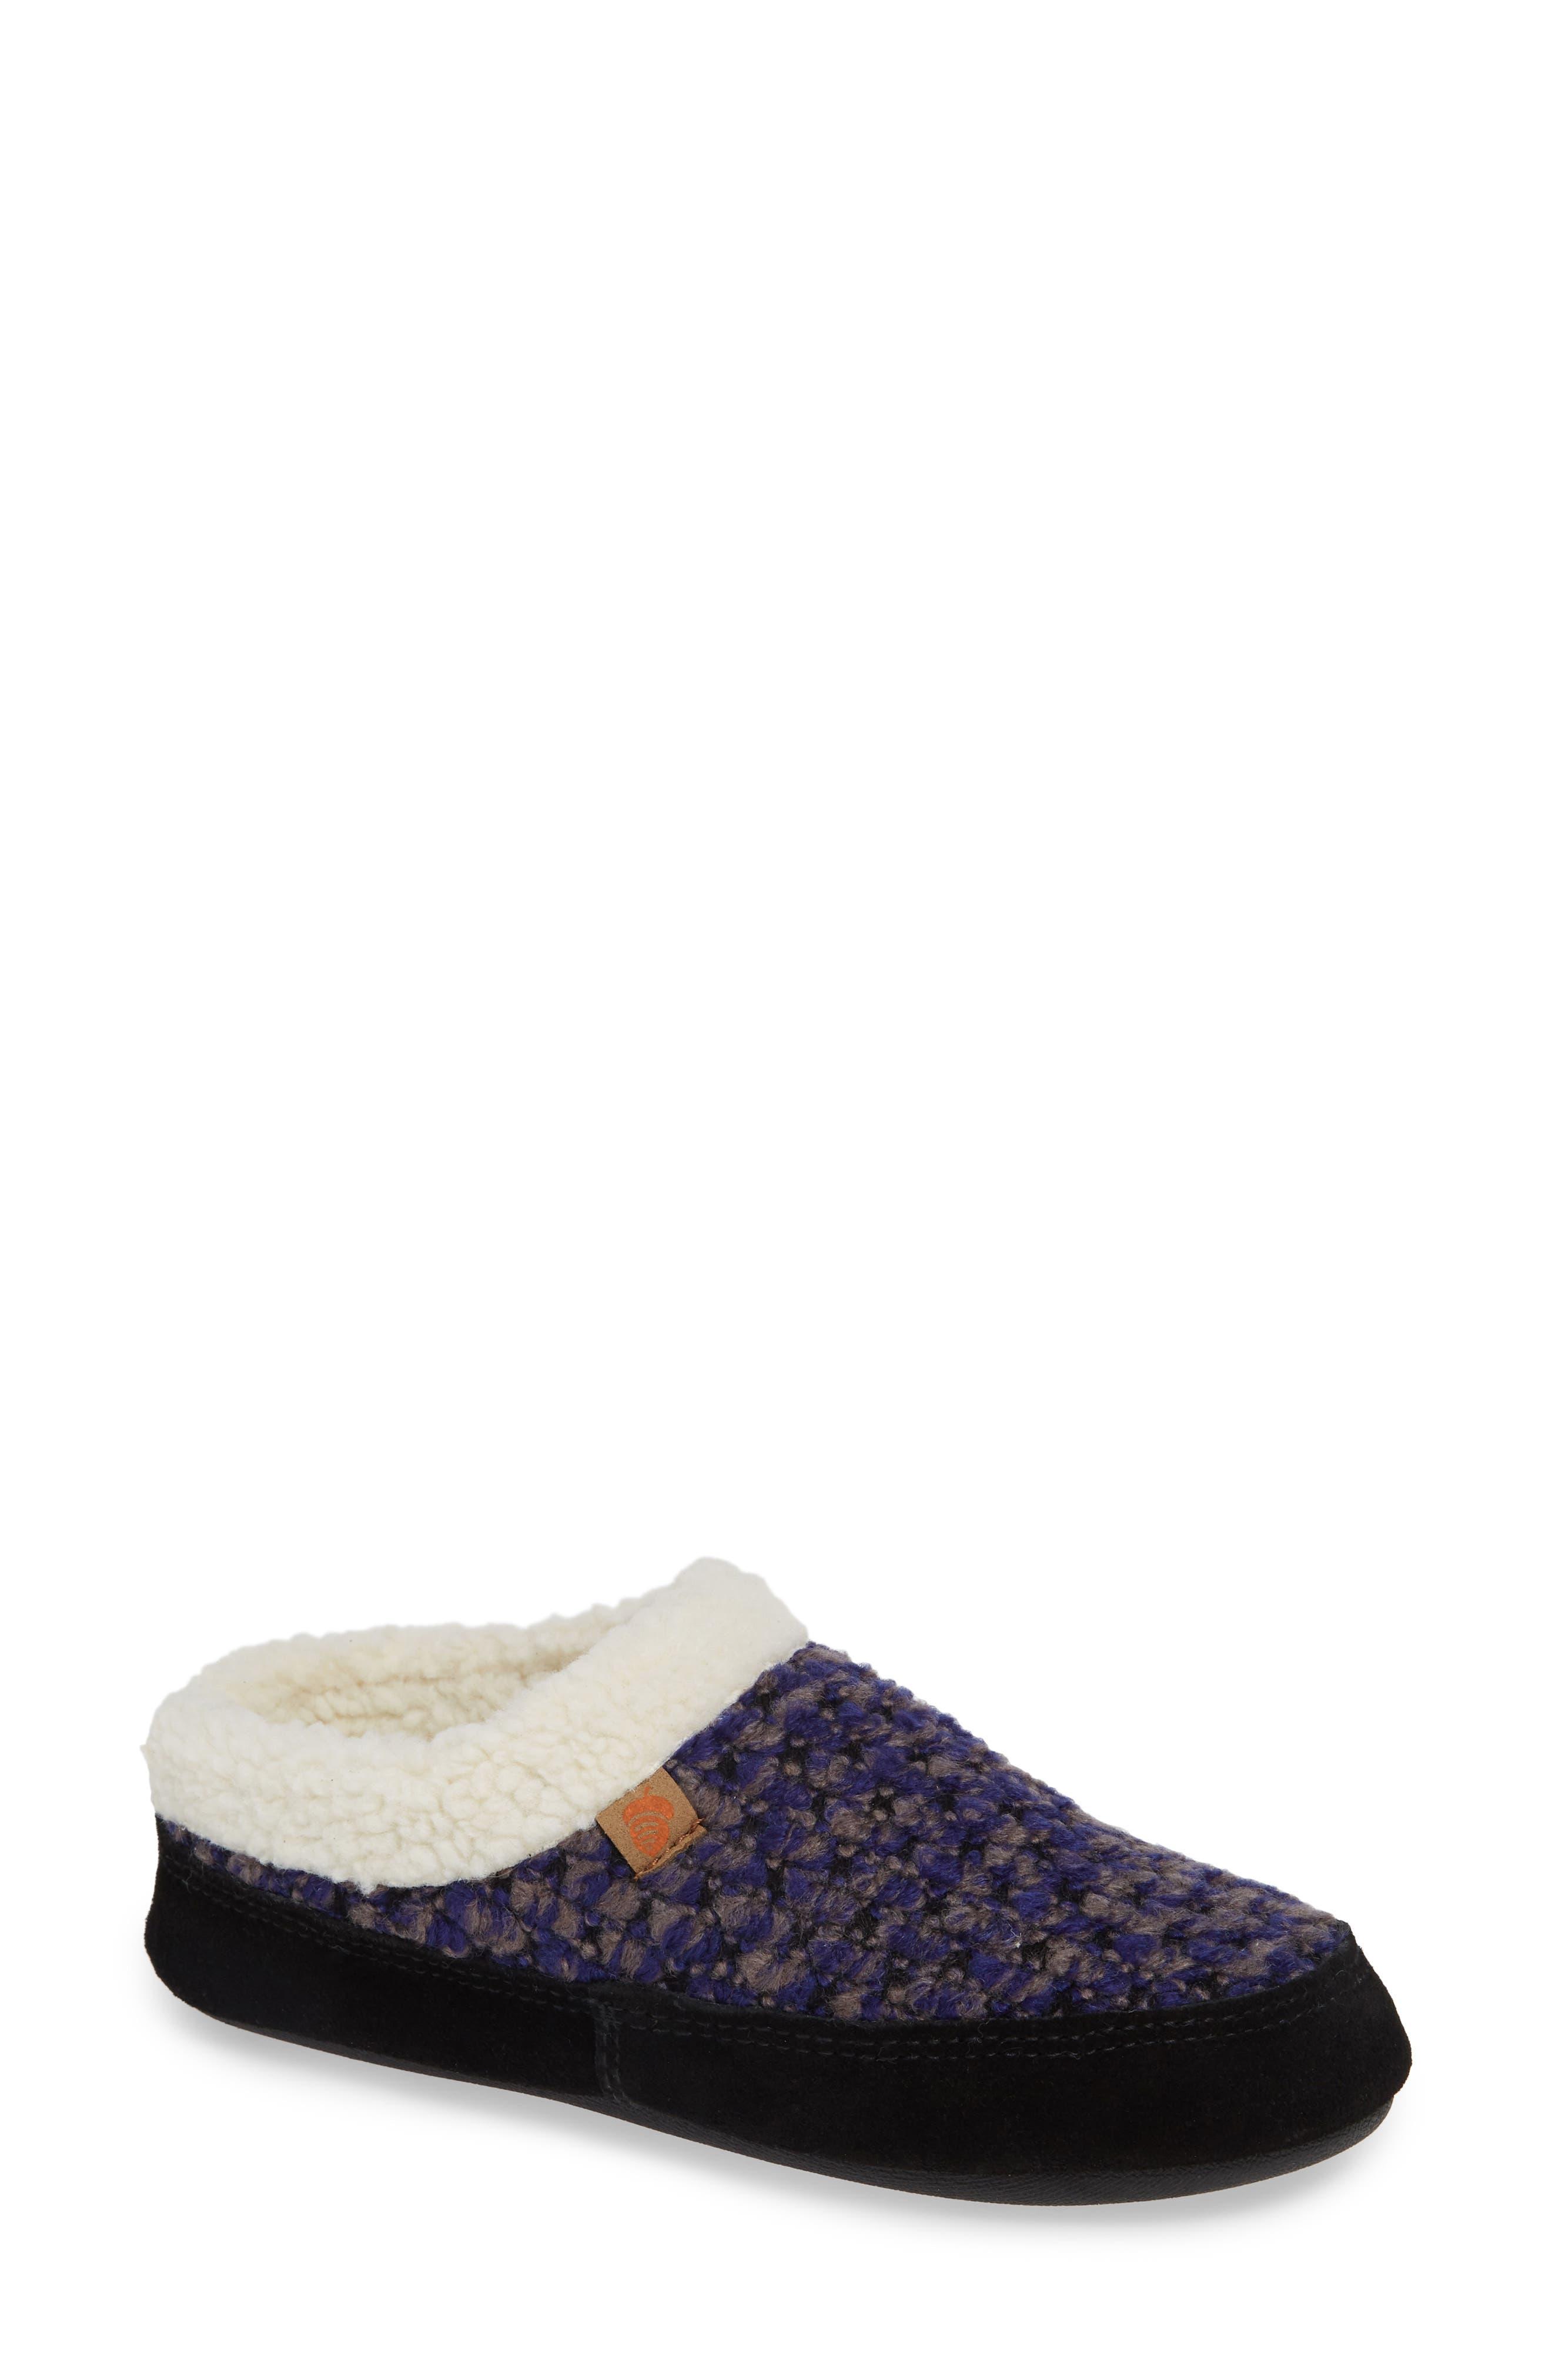 ACORN The Jam Mule Slipper, Main, color, BLUEBERRY FABRIC